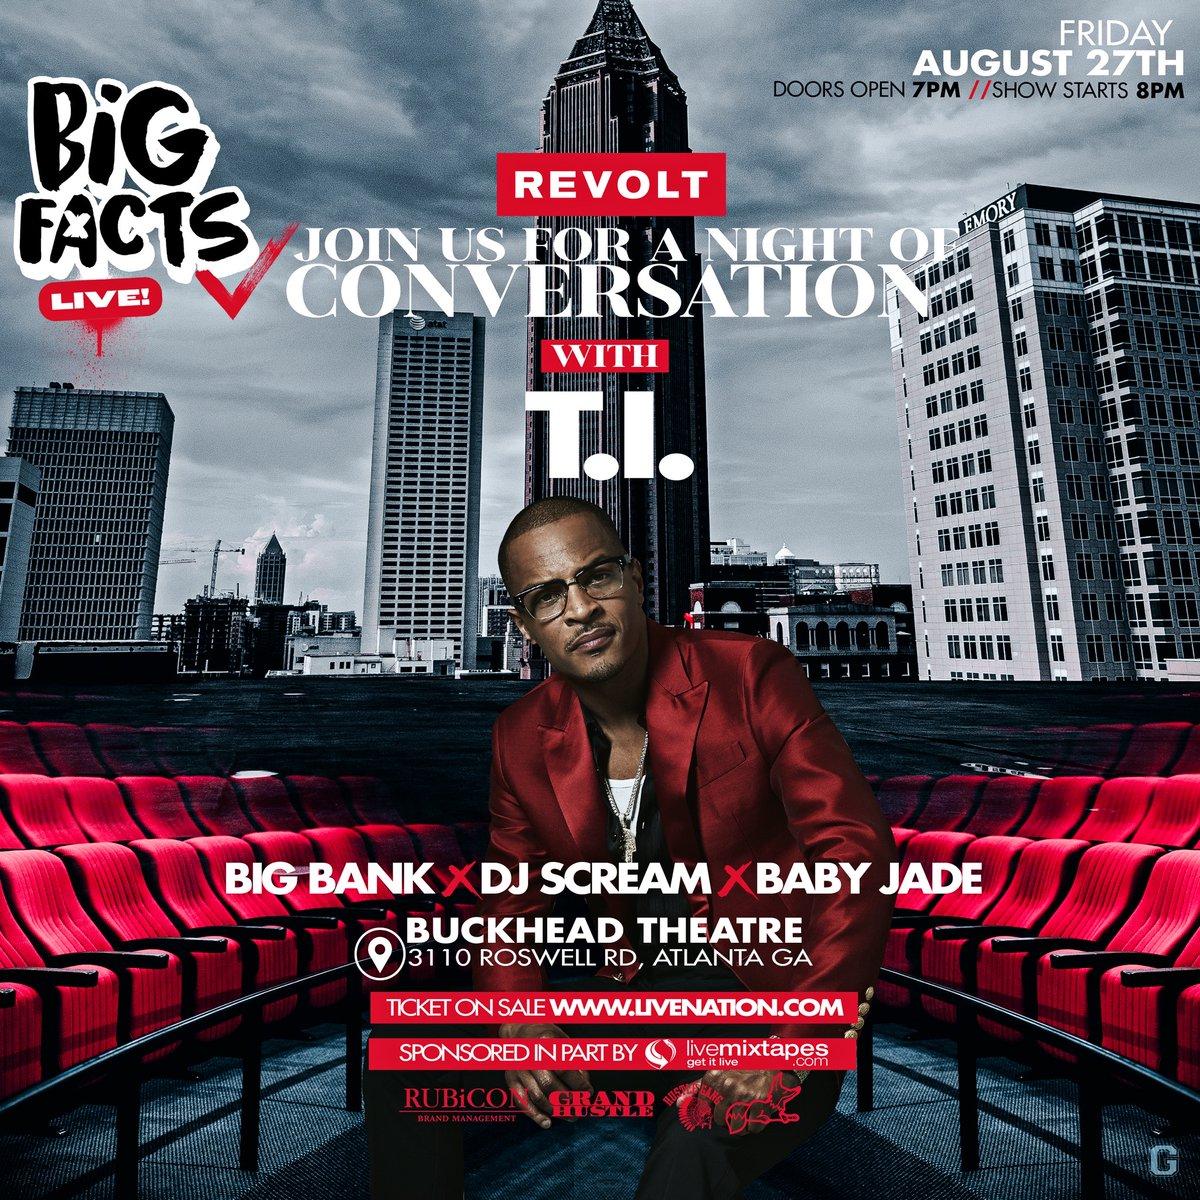 . @bigfactspod LIVE with @tip ‼️ Friday August 27th @ Buckhead Theatre ATL‼️ Get Tickets Now: ticketmaster.com/event/0E005AF4… Shoutout To @revolttv @livemixtapes